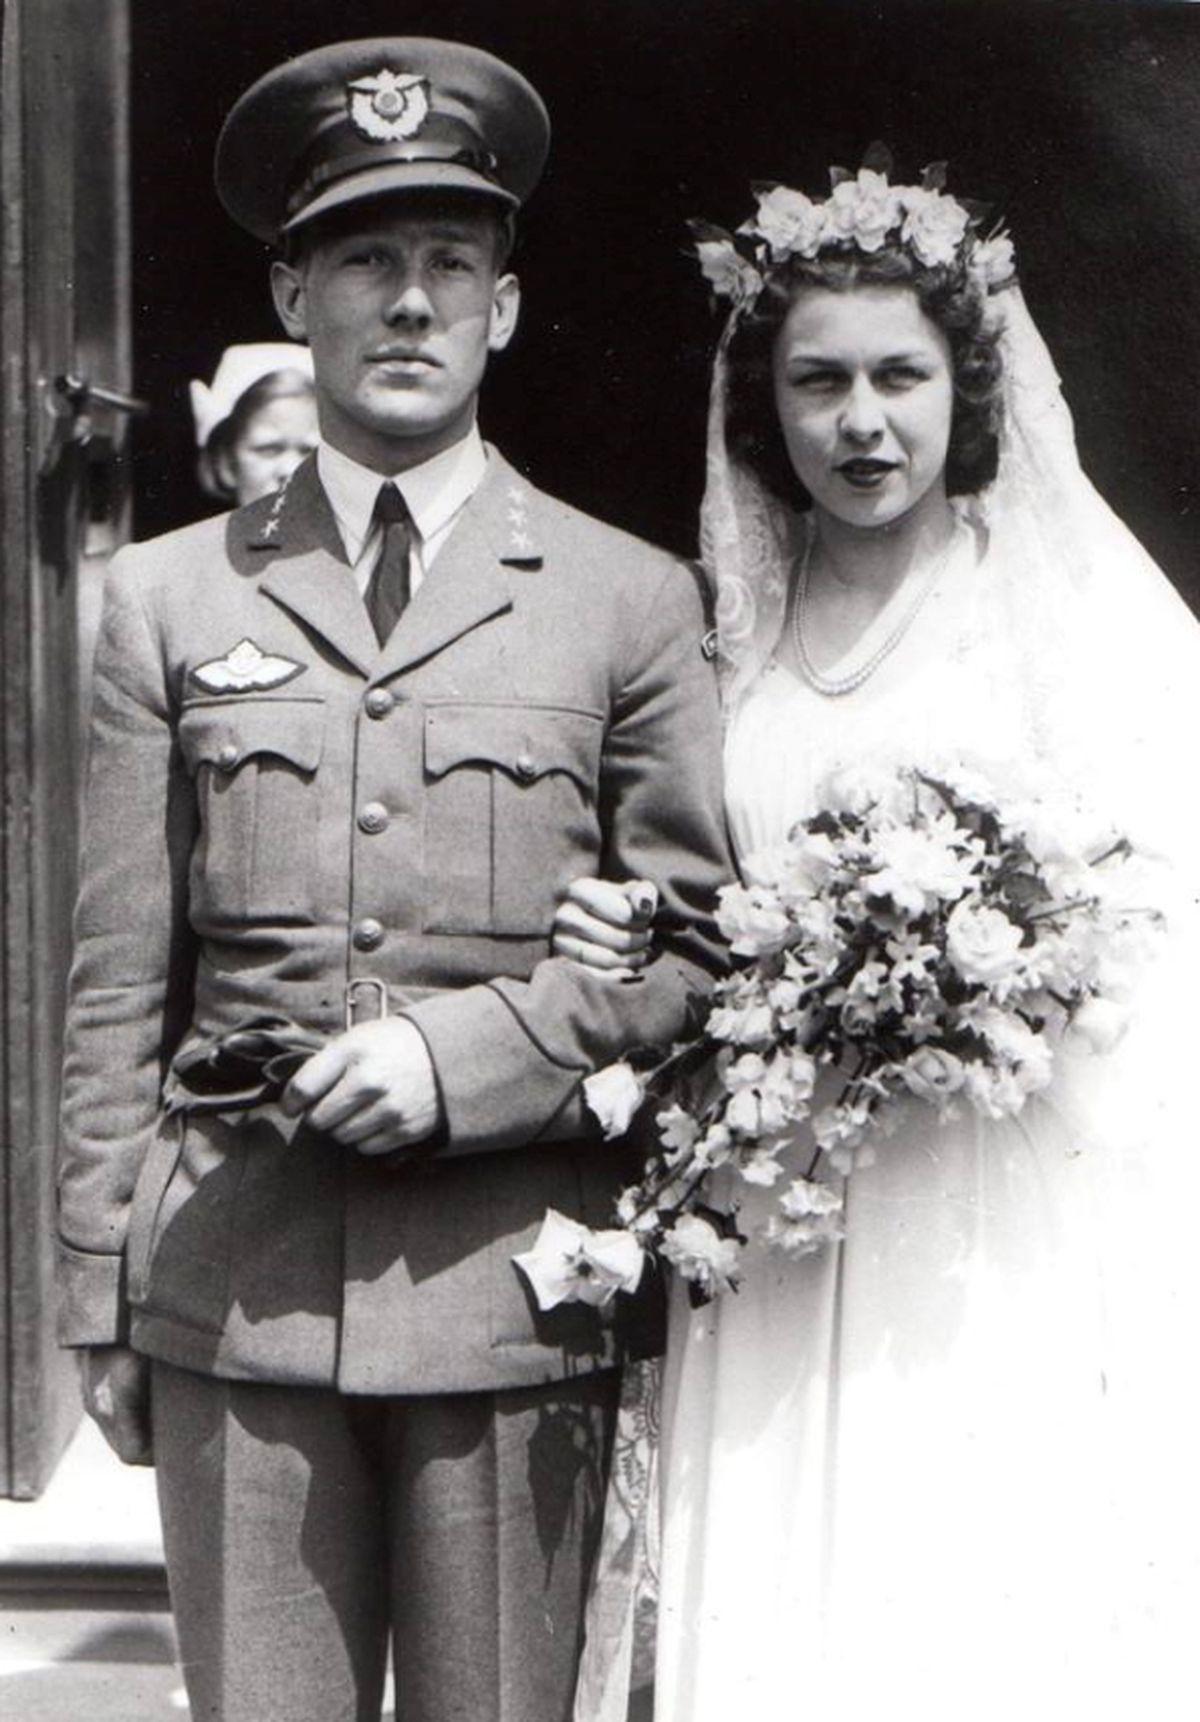 Karl's wedding to Sonja Irgens in June 1941.